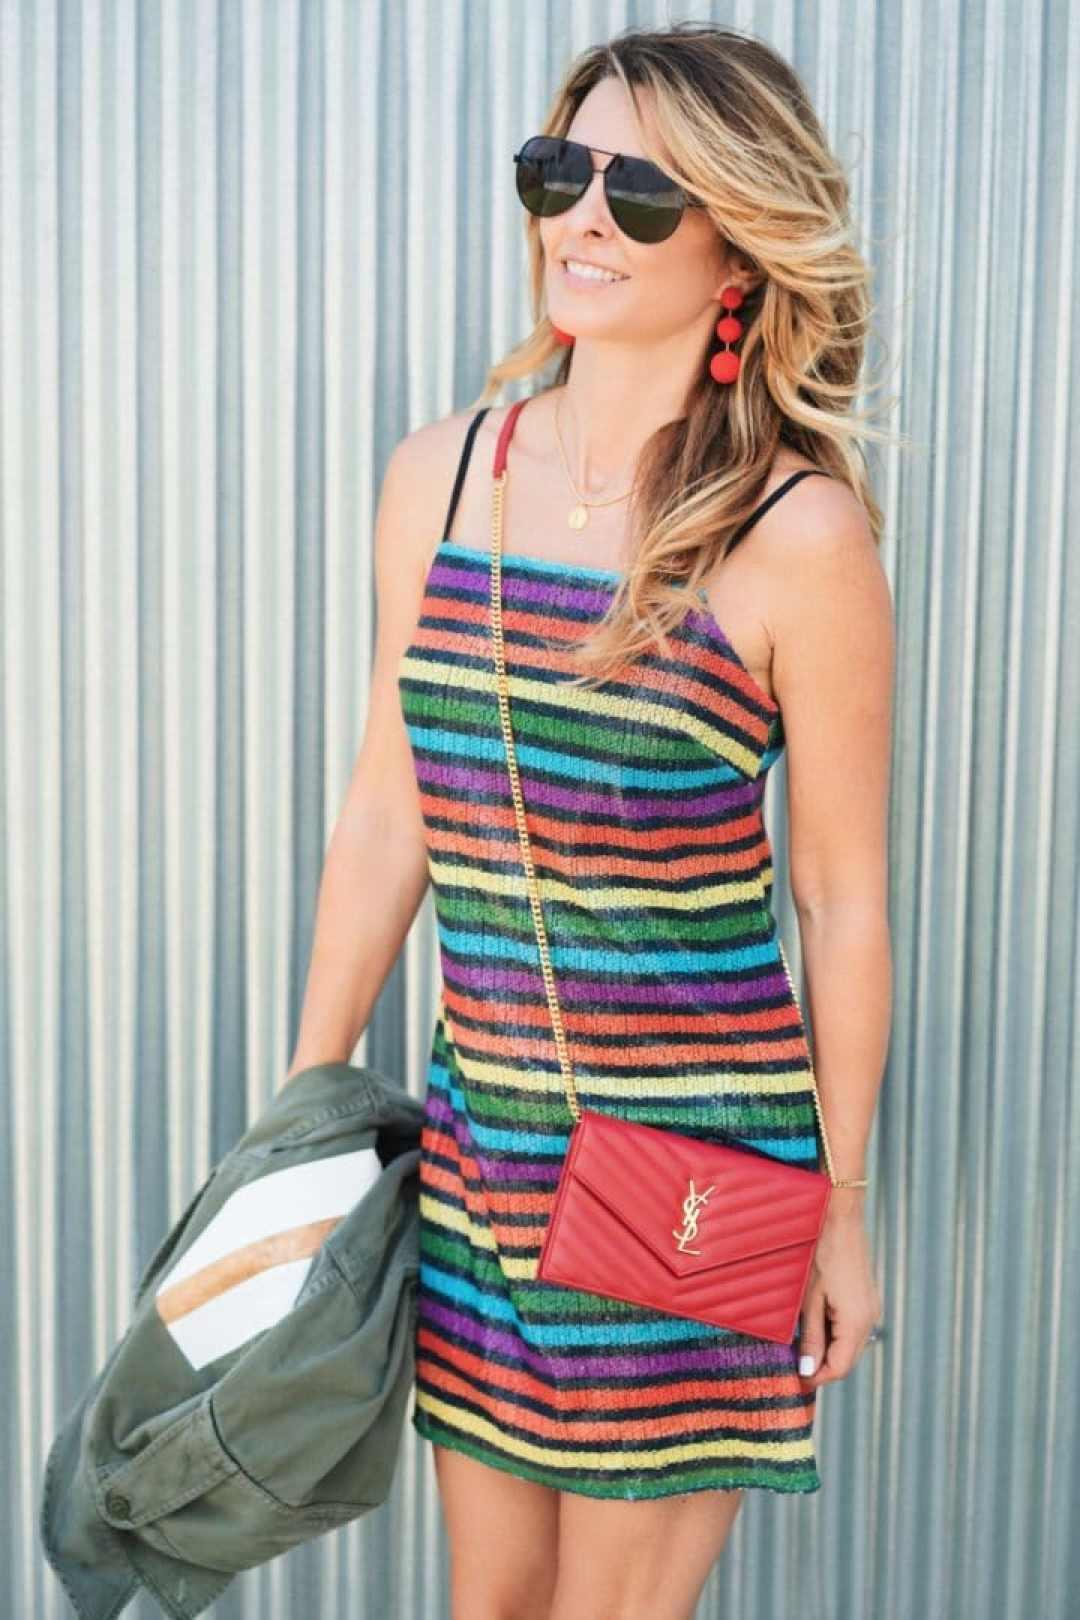 Summer Fashion Trends: Rainbow Print